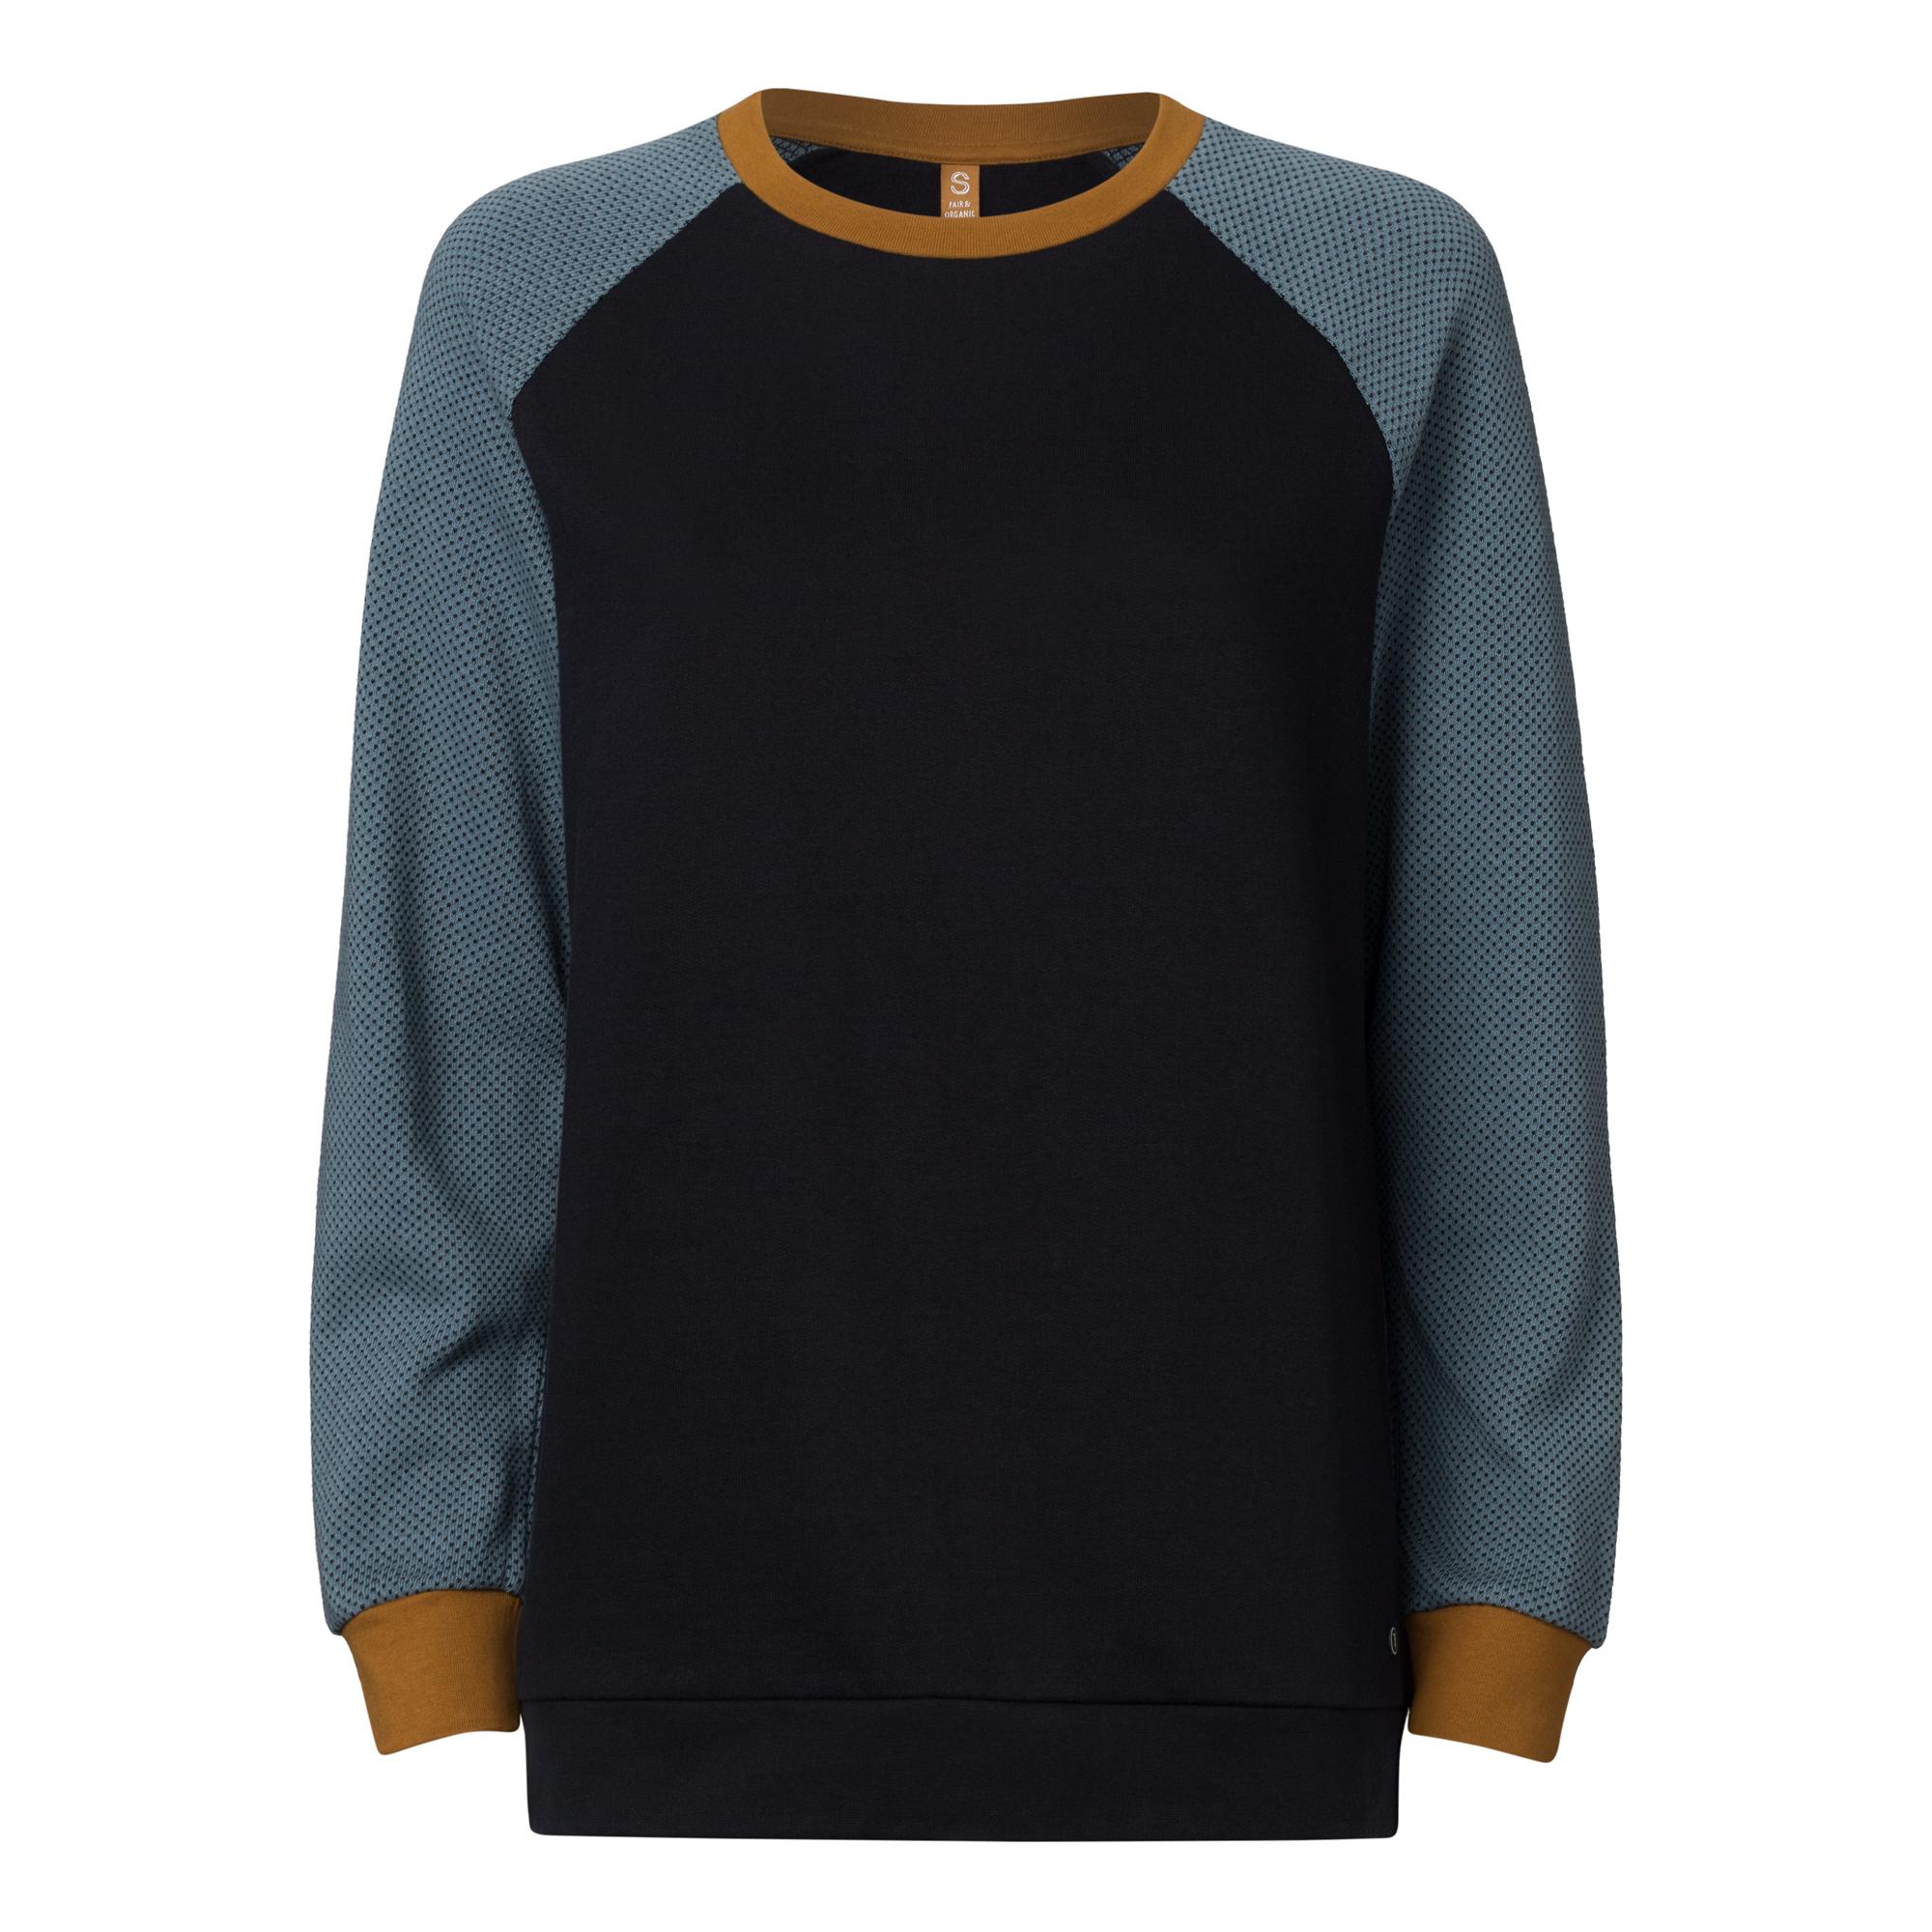 TT1037 Raglan Sweater Woman Black/Iceblue GOTS & Fairtrade